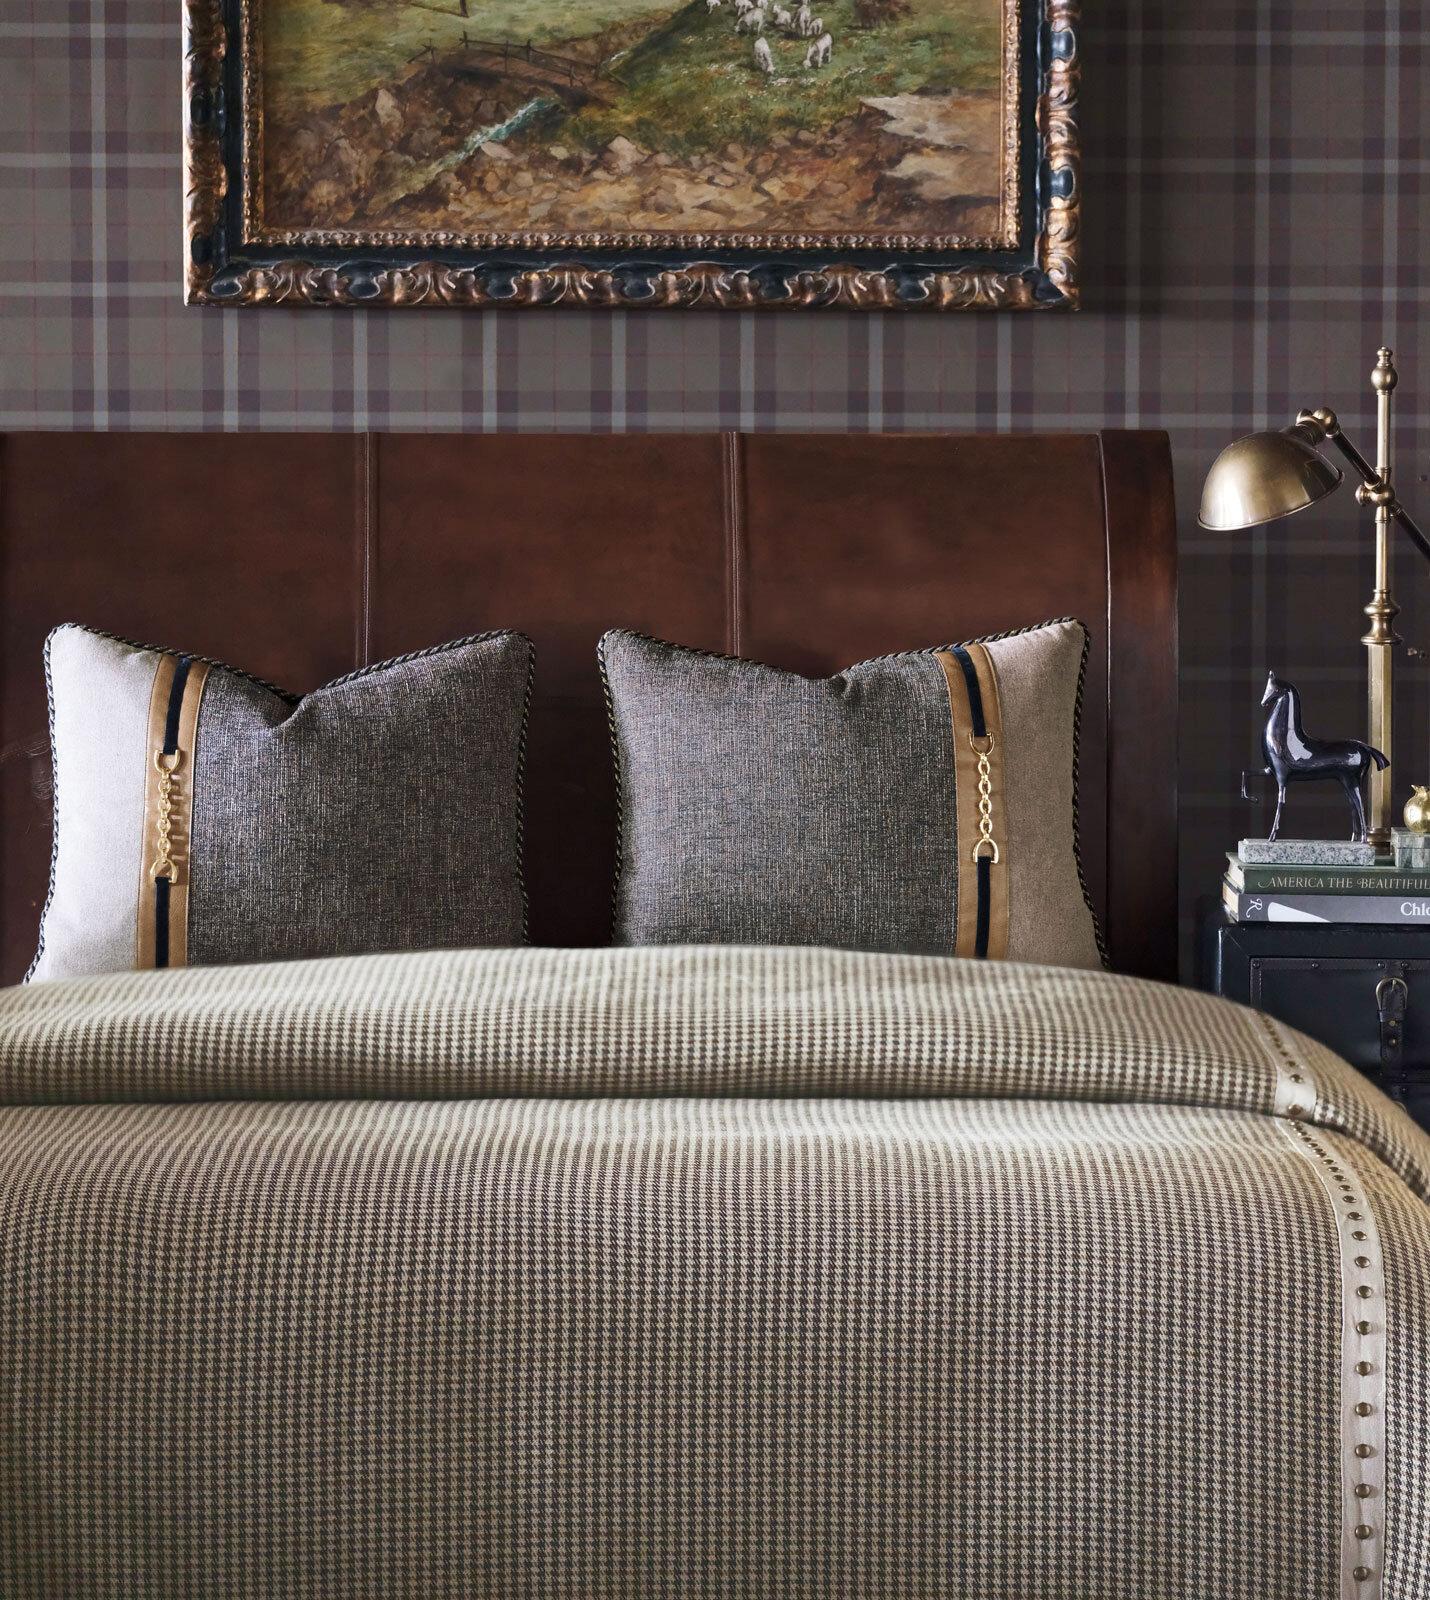 edward brown houndstooth comforter